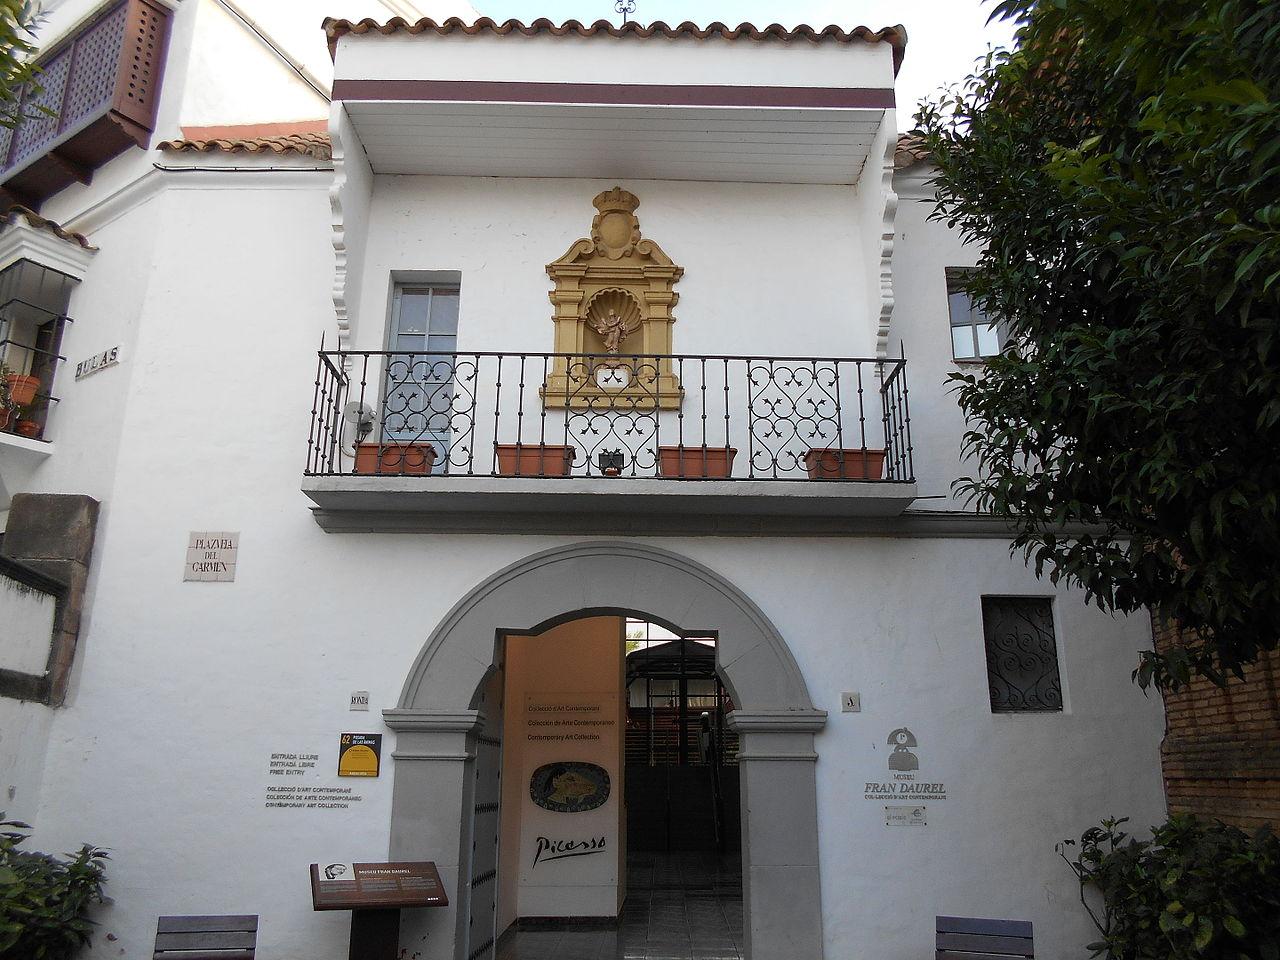 Испанская деревня, музей Франа Дауреля